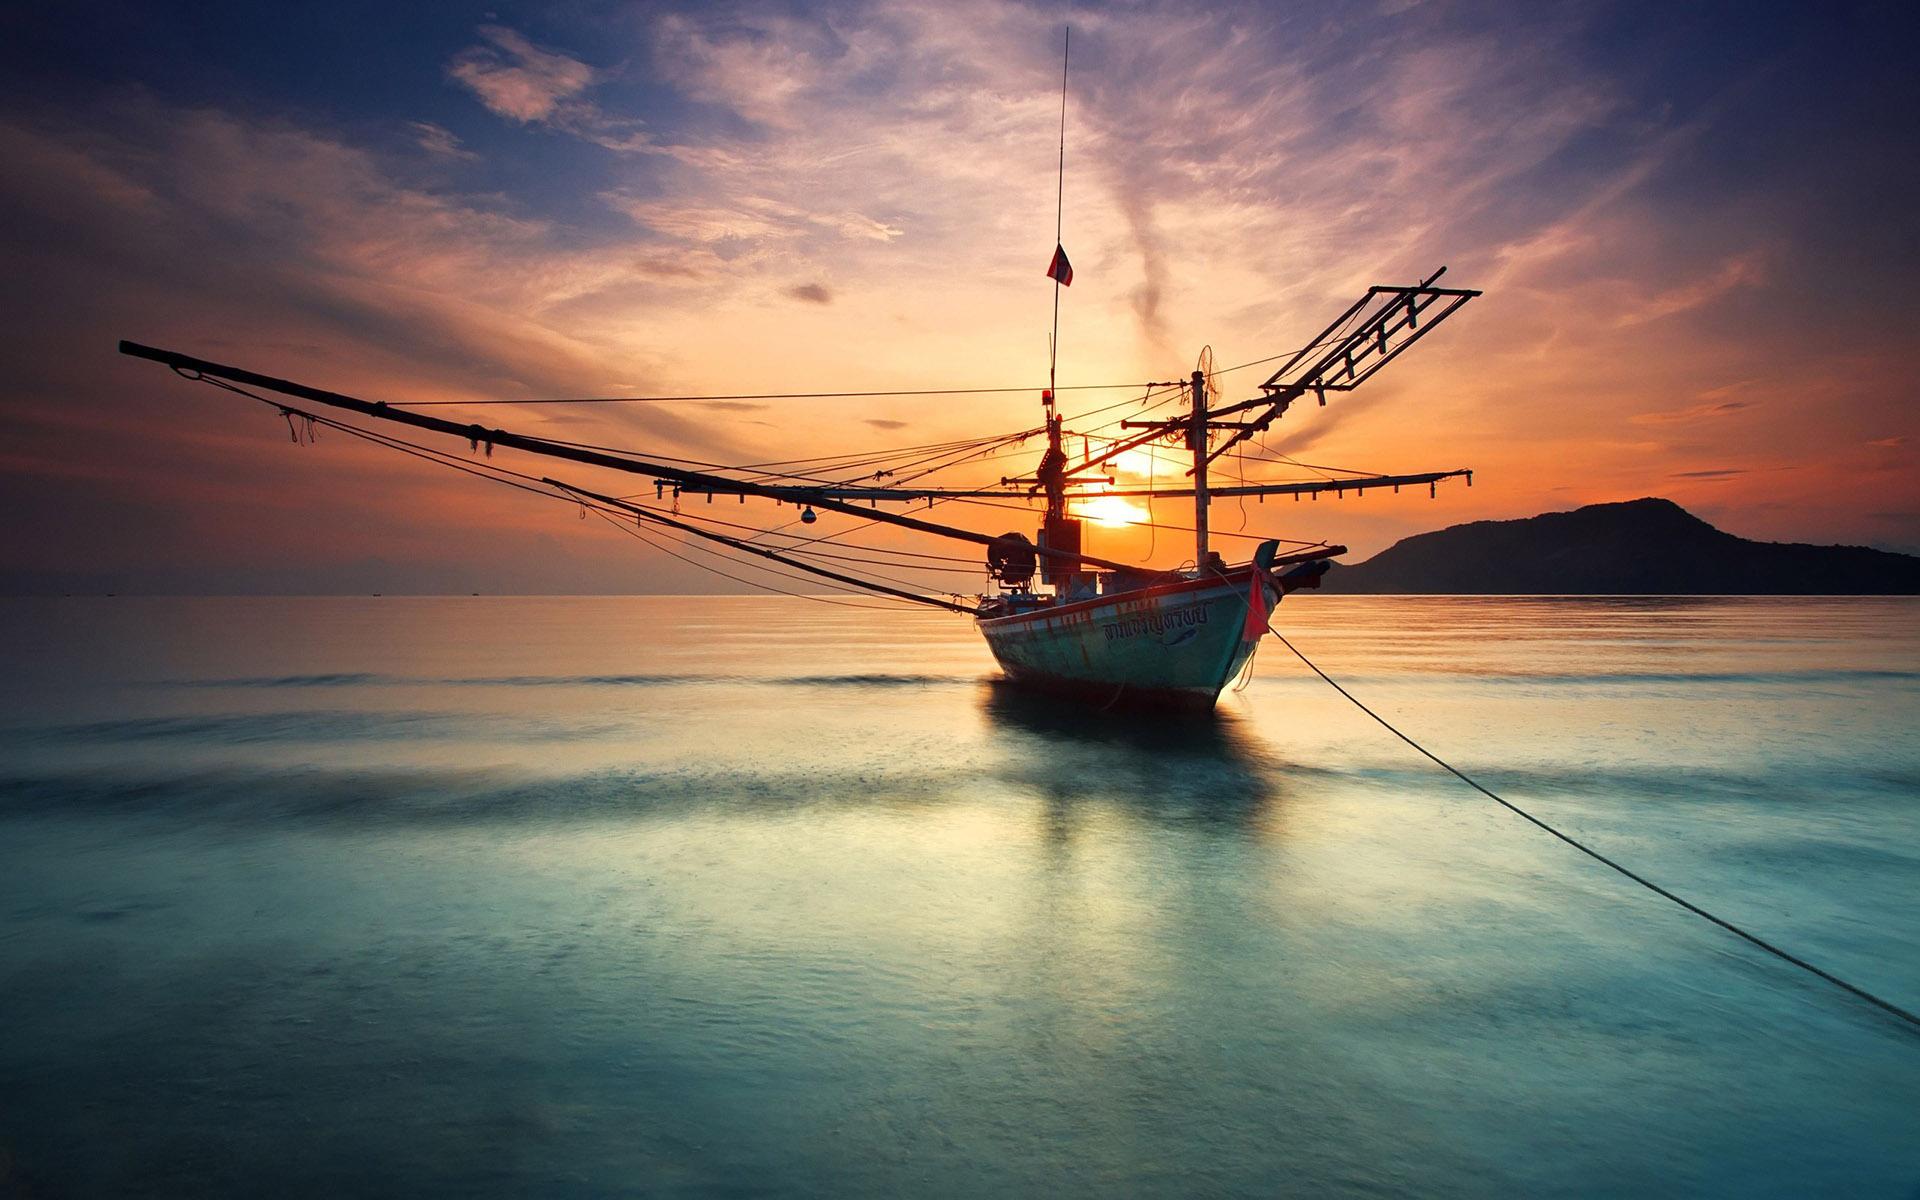 3840x2400 wallpaper ocean boat - photo #4